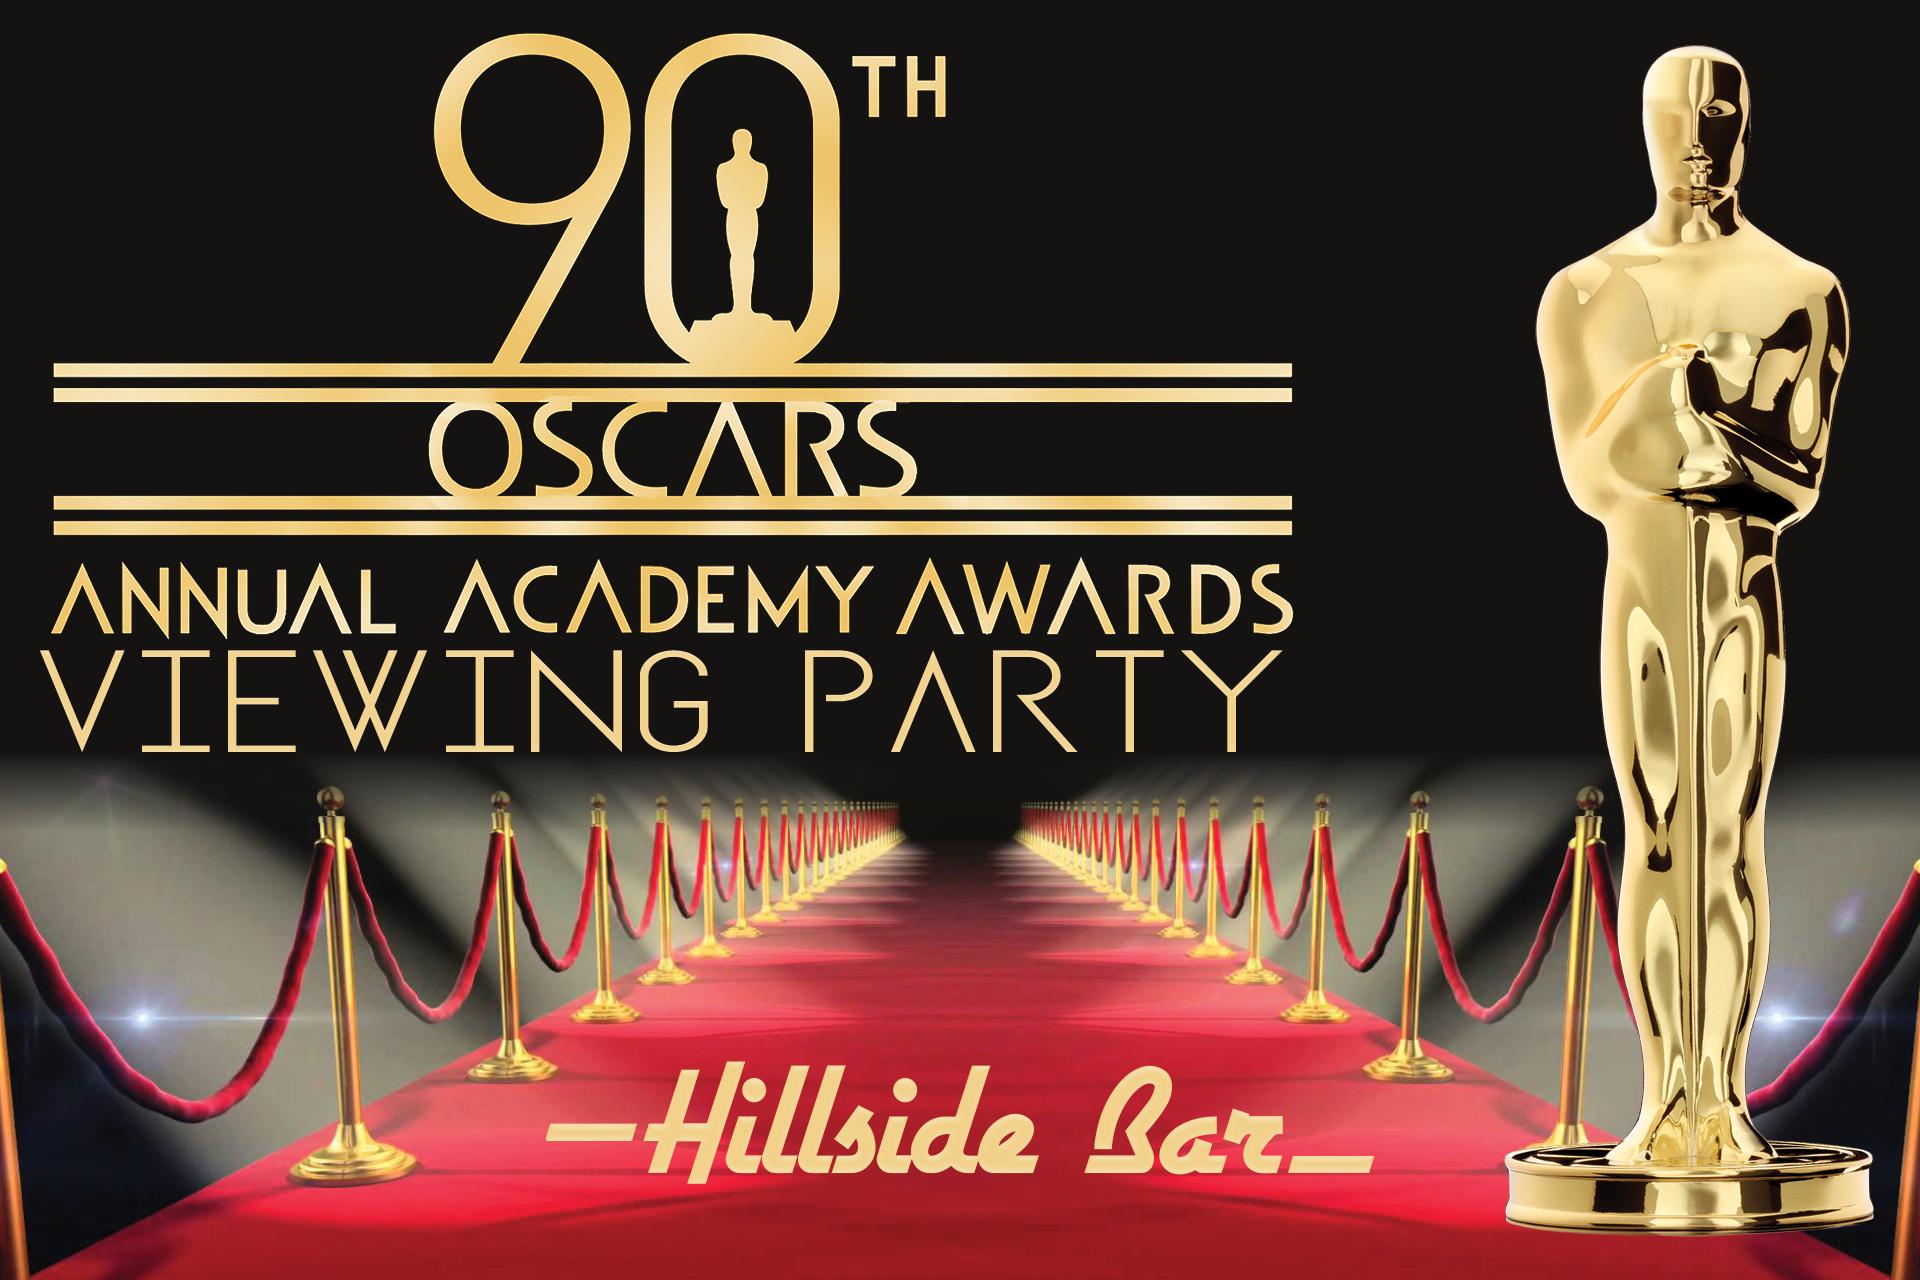 Hilside Oscar Party